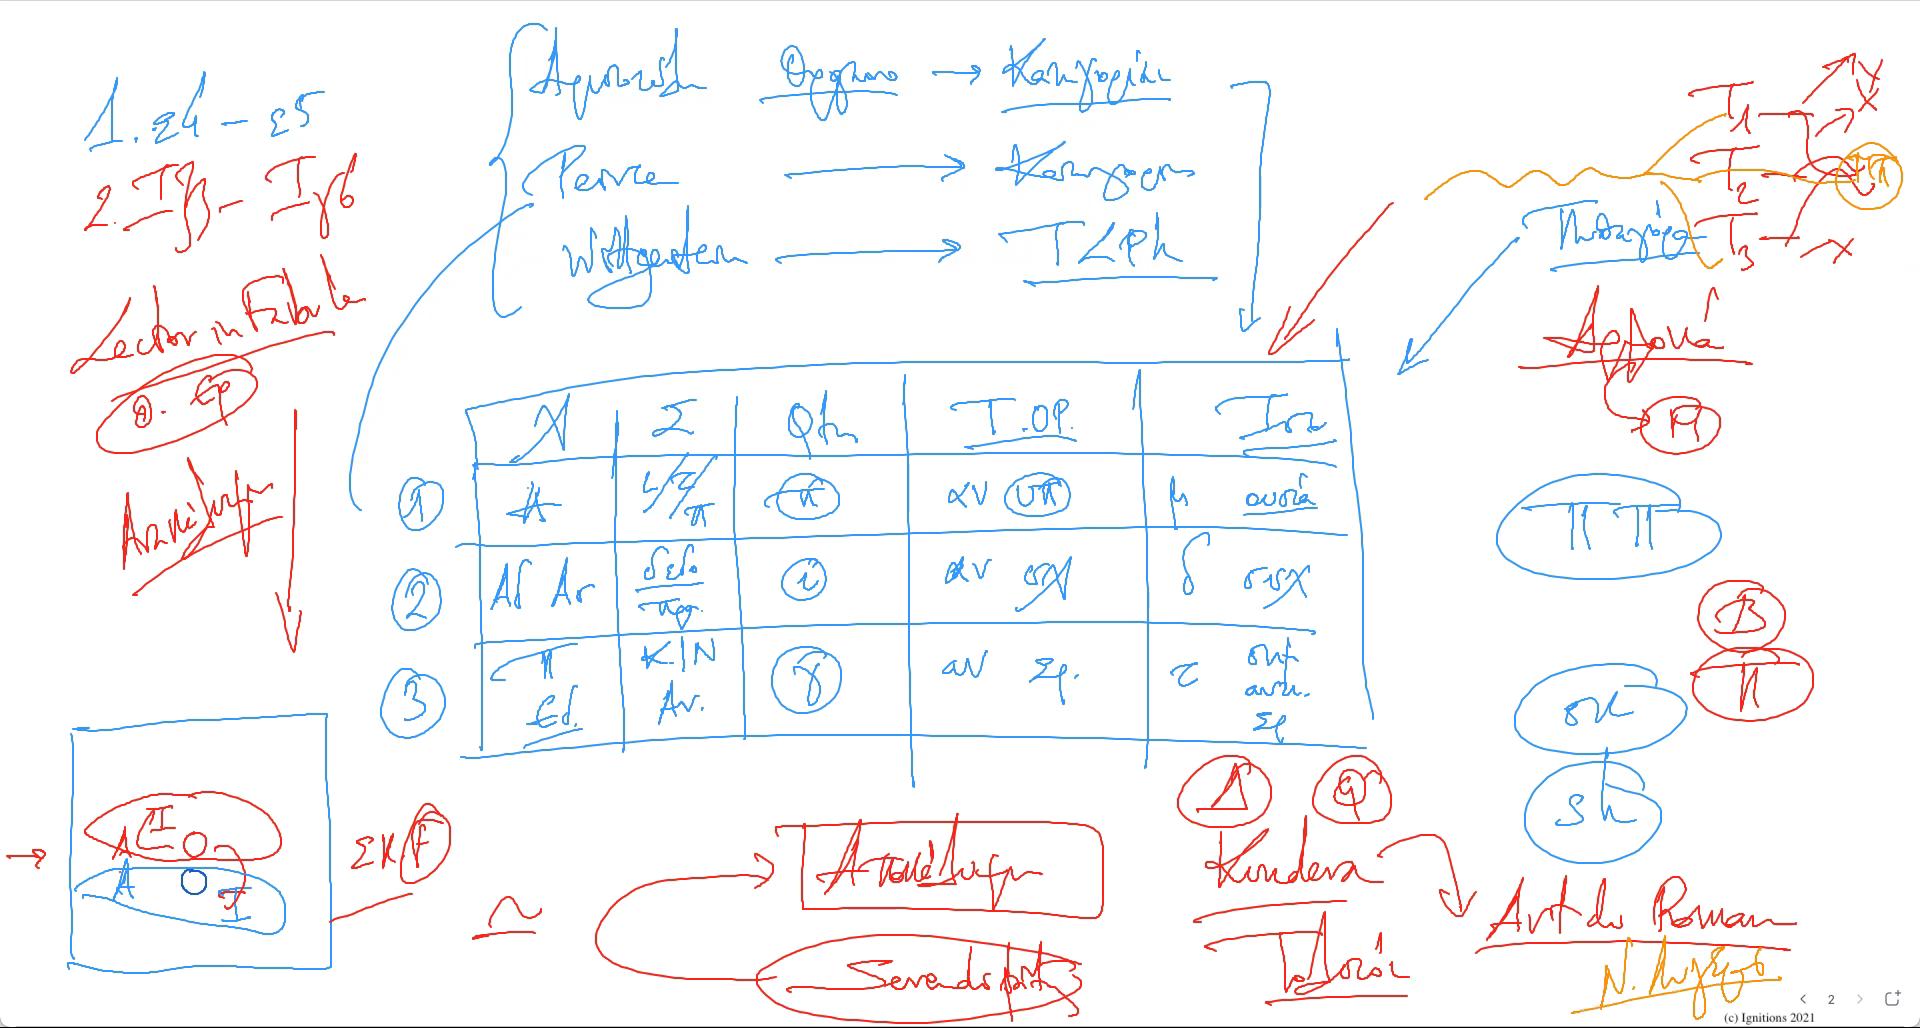 57821 - II - e-Μάθημα: Ο πολλαπλός κόσμος του Umberto Eco. (Dessin)